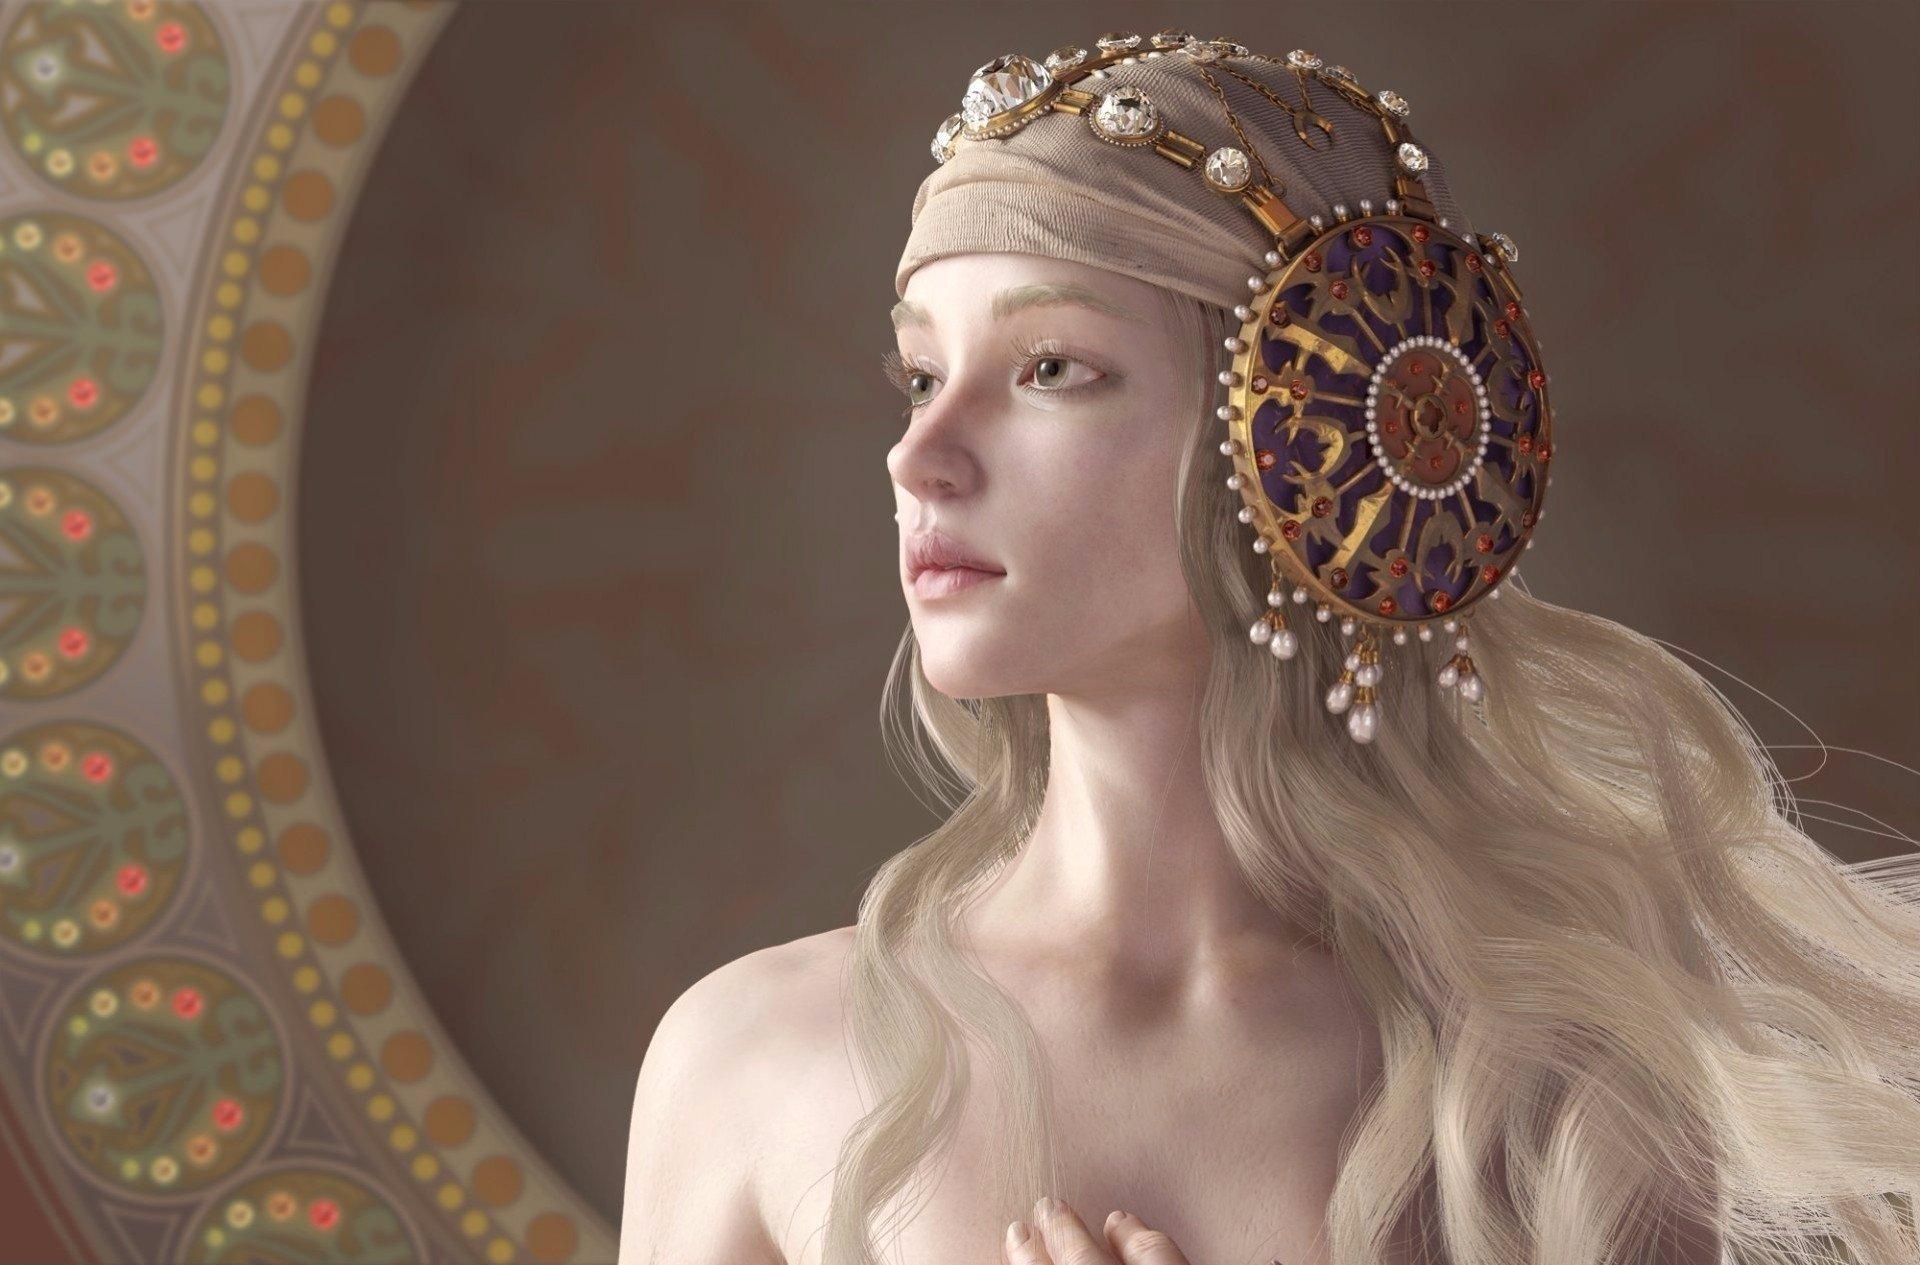 Fantasy - Women  Fantasy Woman Girl White Hair Wallpaper